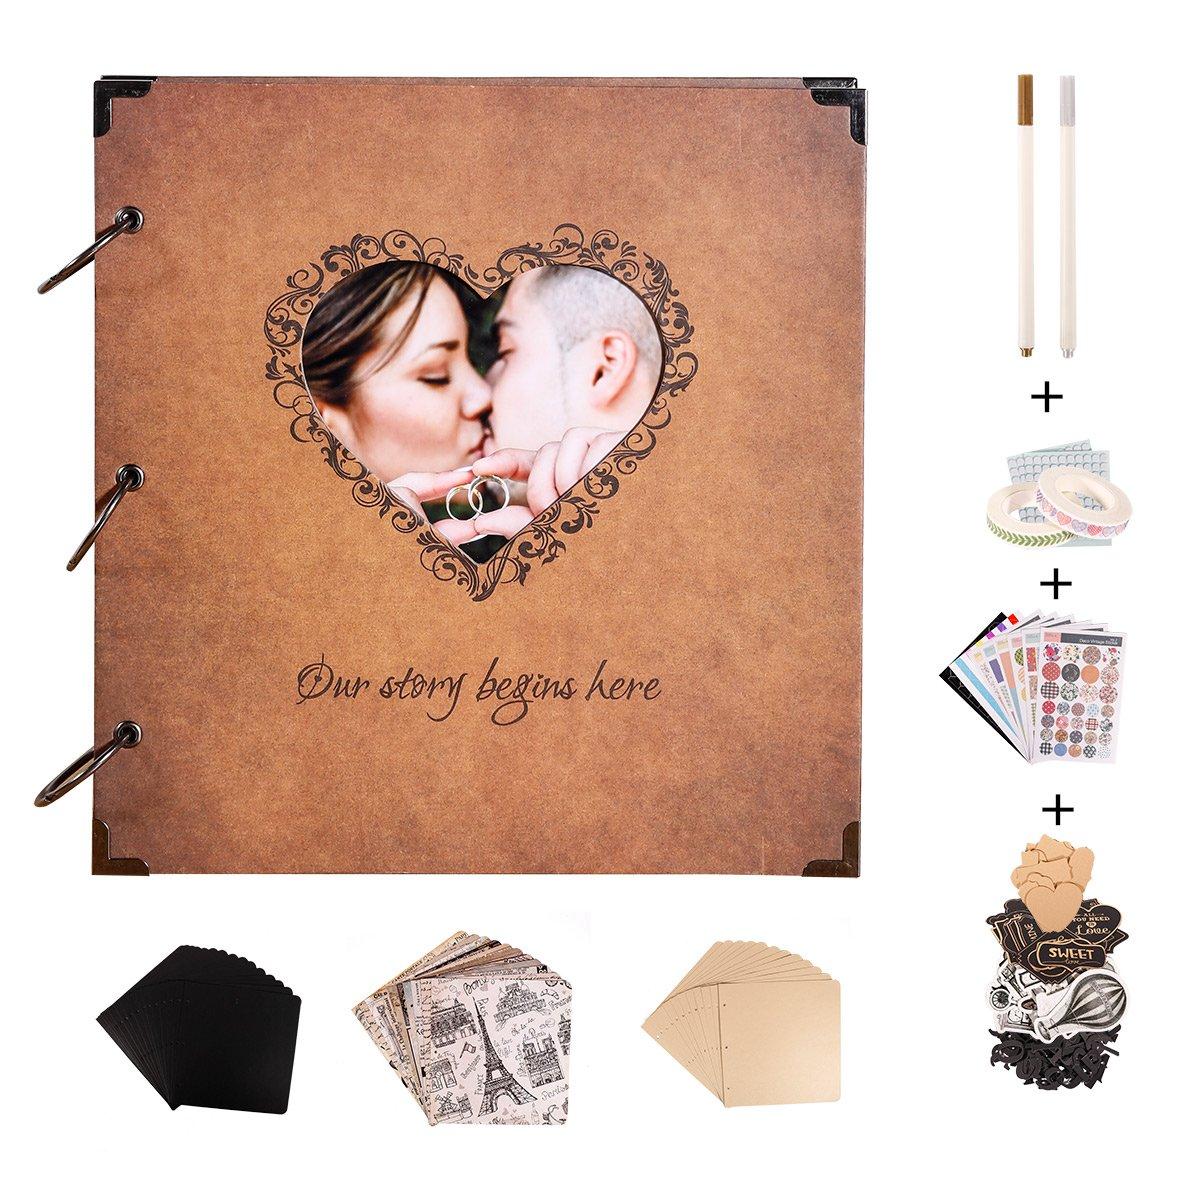 SICOHOME Vintage Scrapbook,10x10.5 Inch Wedding Scrapbook Album with Heart Photo Opening